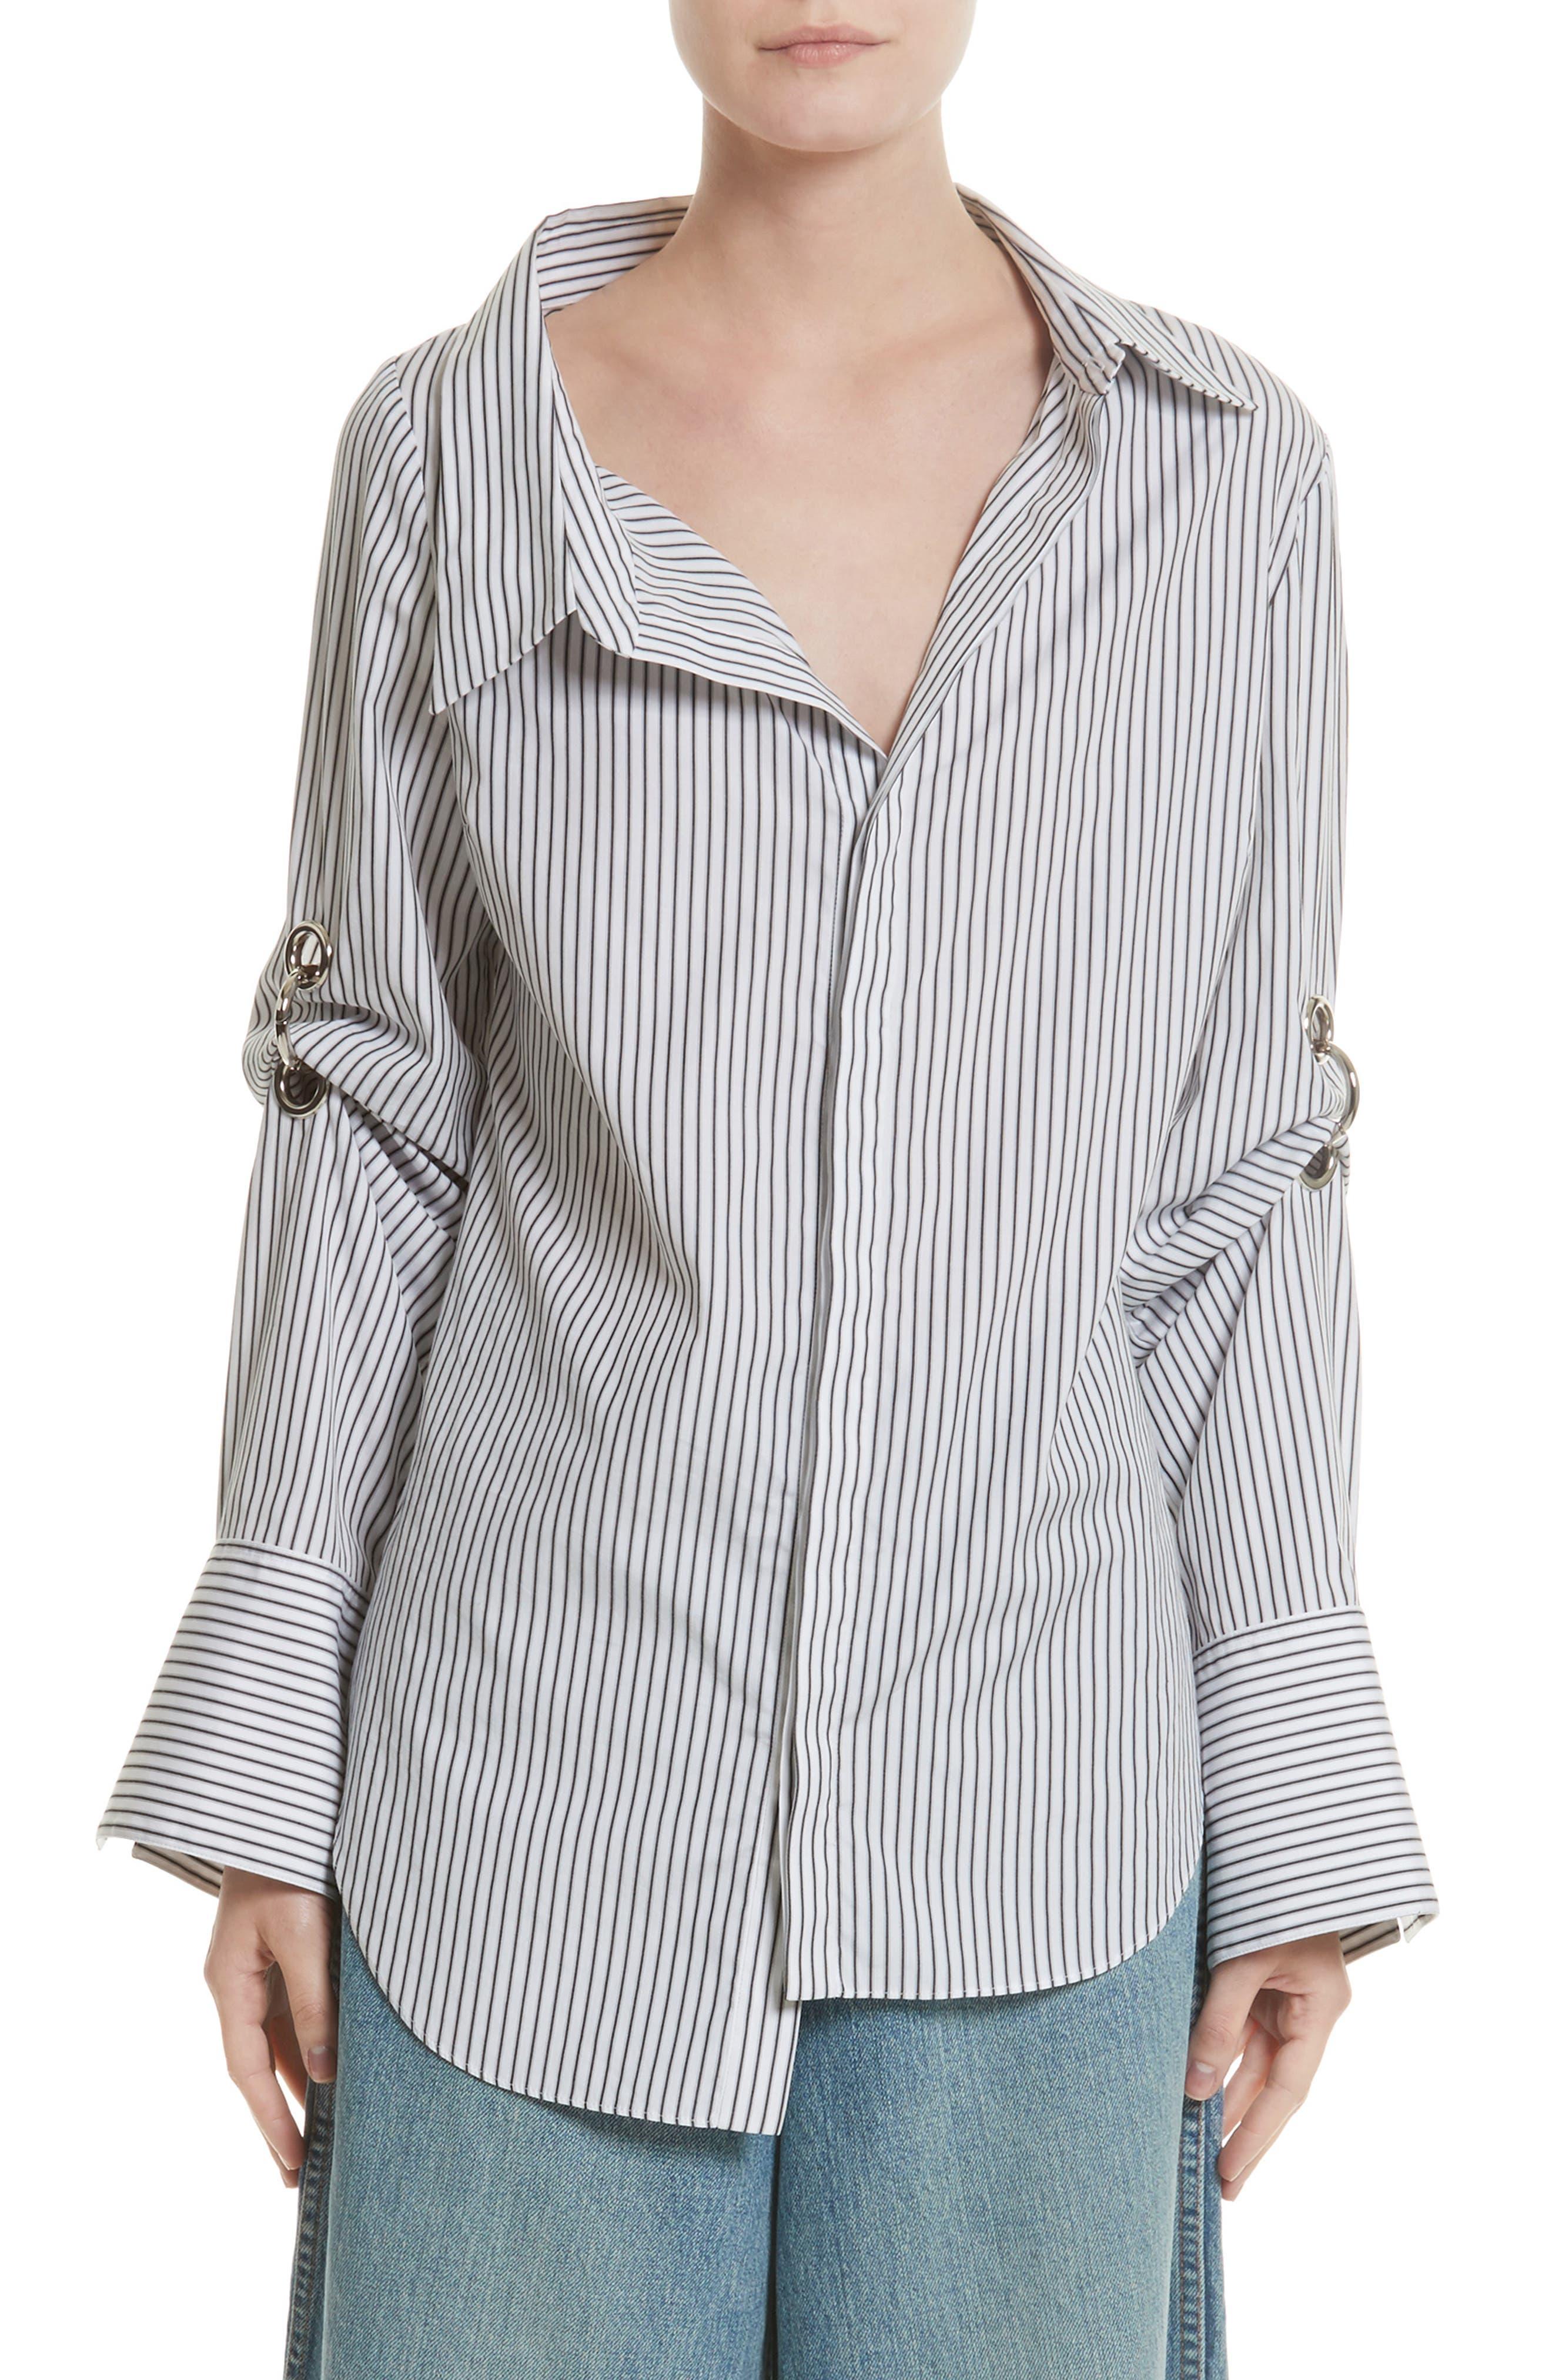 Grommet Scrunch Sleeve Shirt,                         Main,                         color, Blue/ White